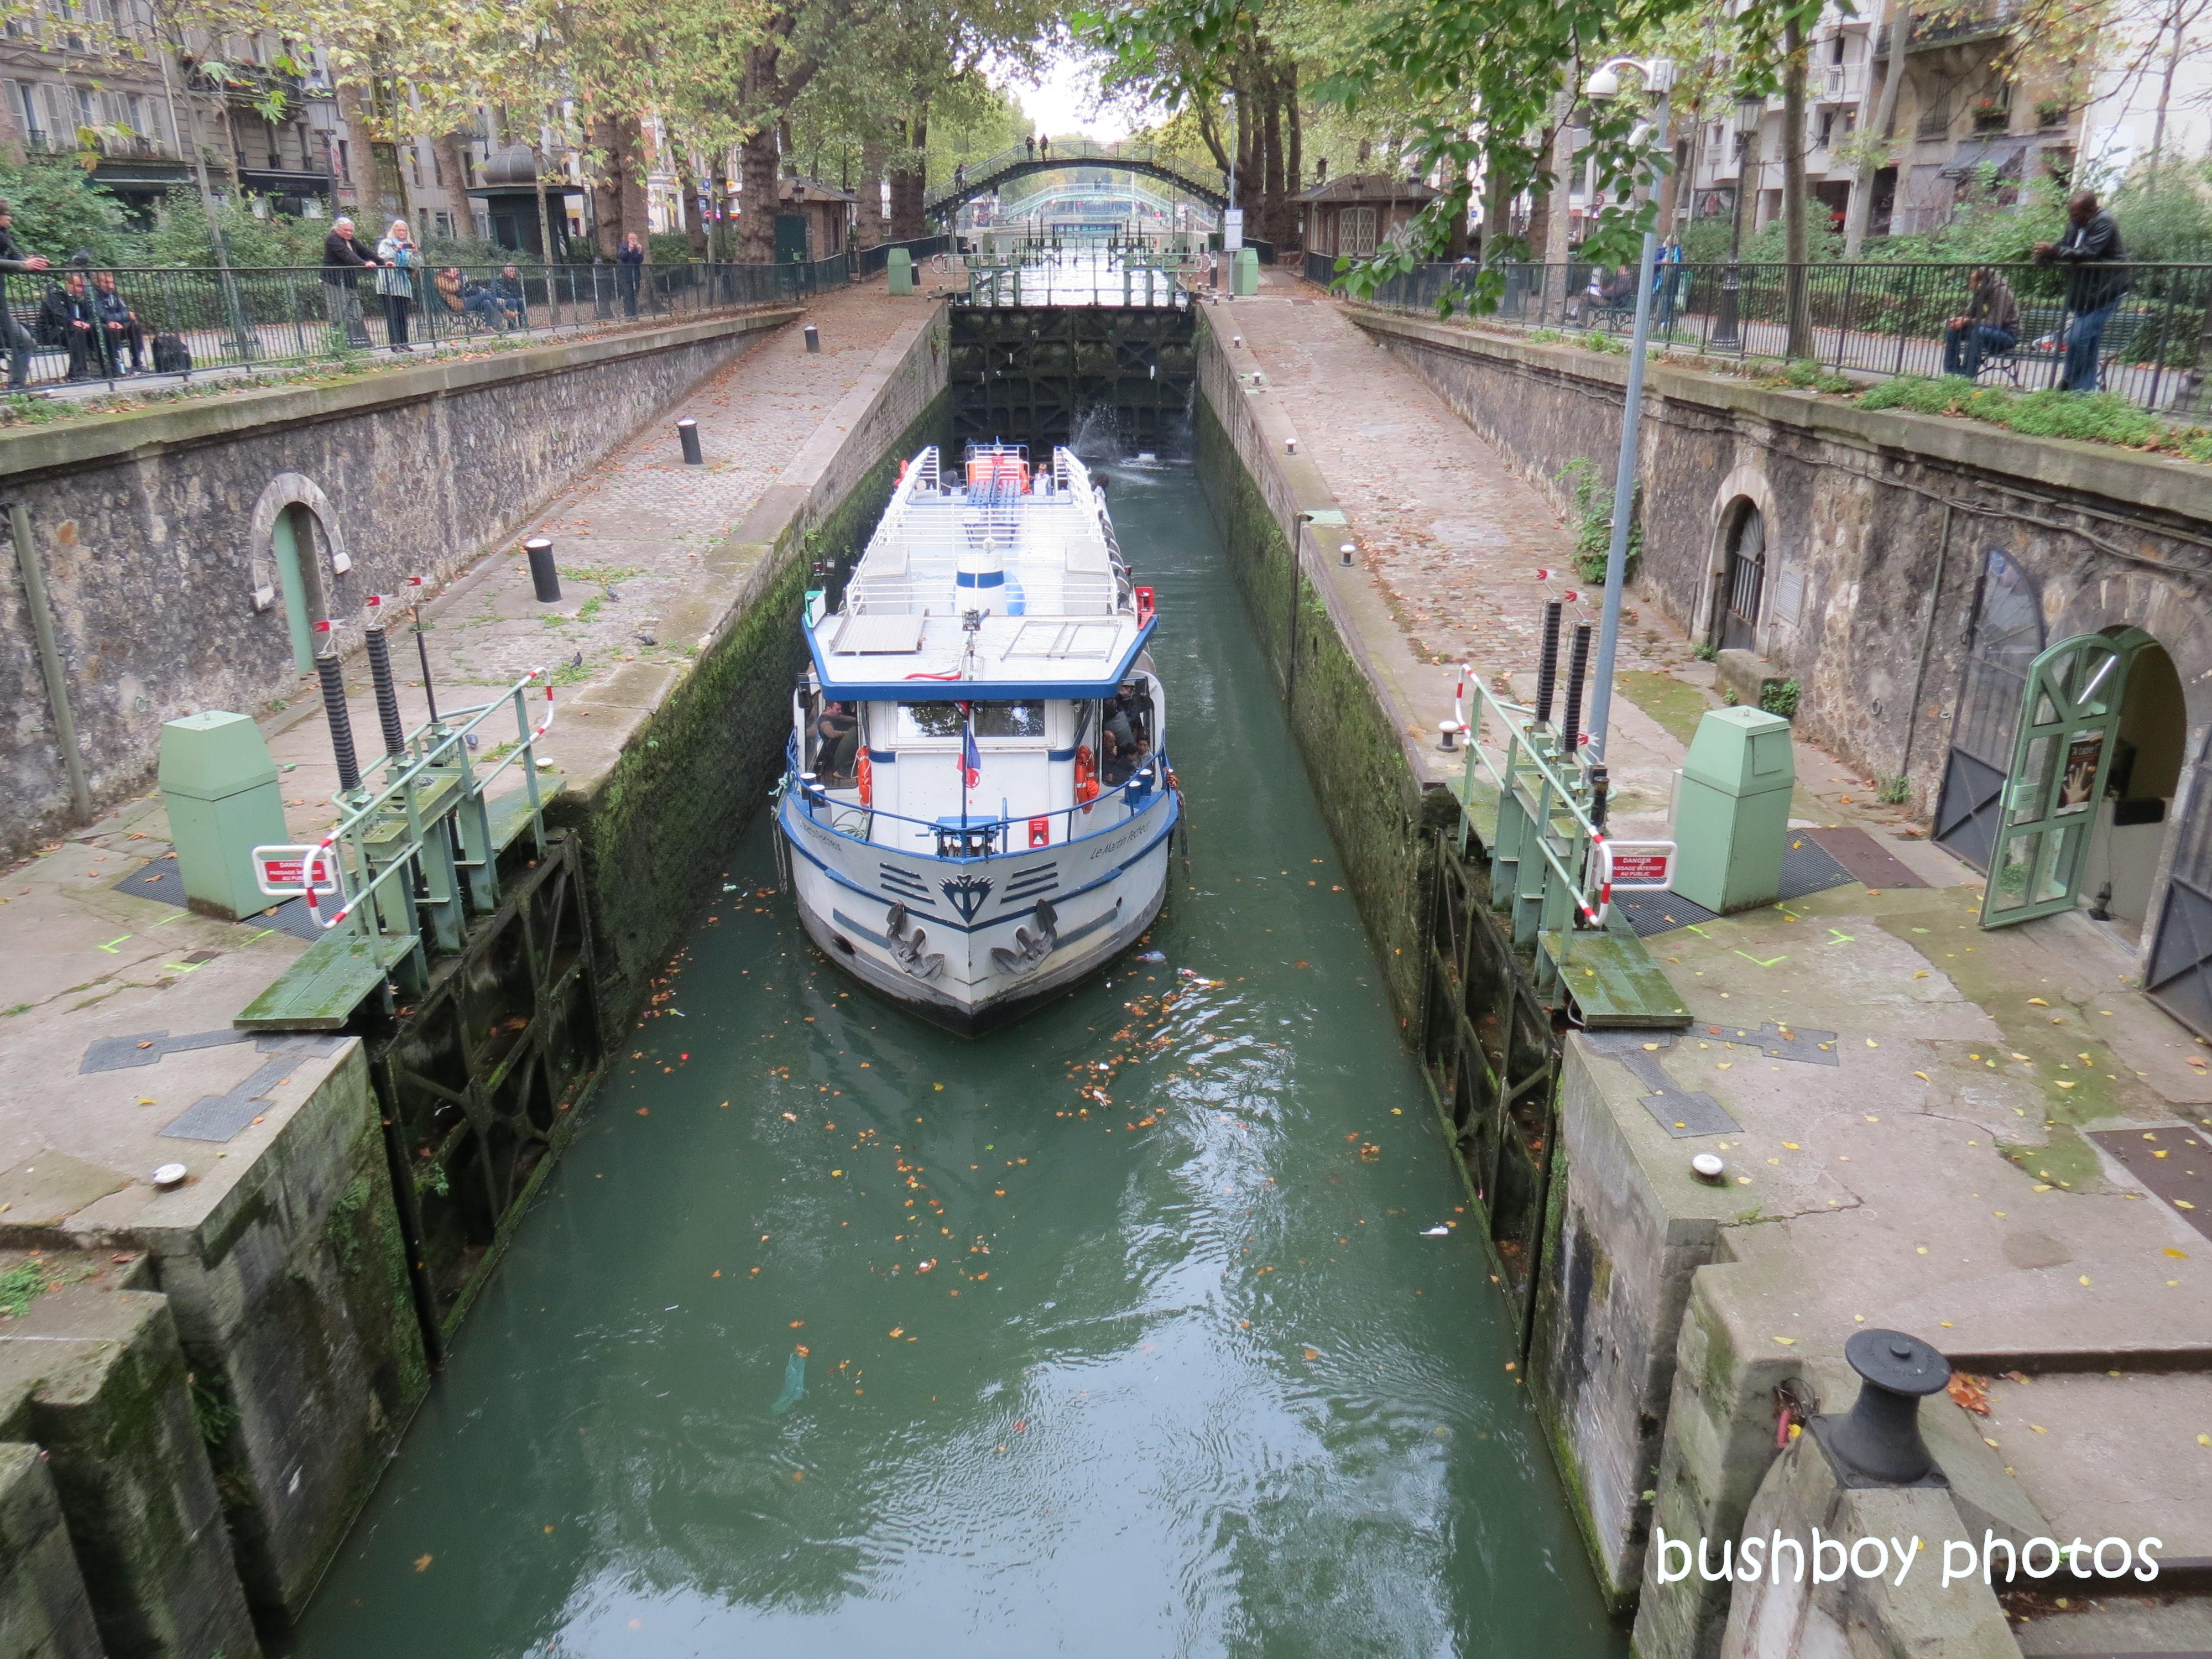 190813_blog_challenge_lock_paris_canal_stmartin4